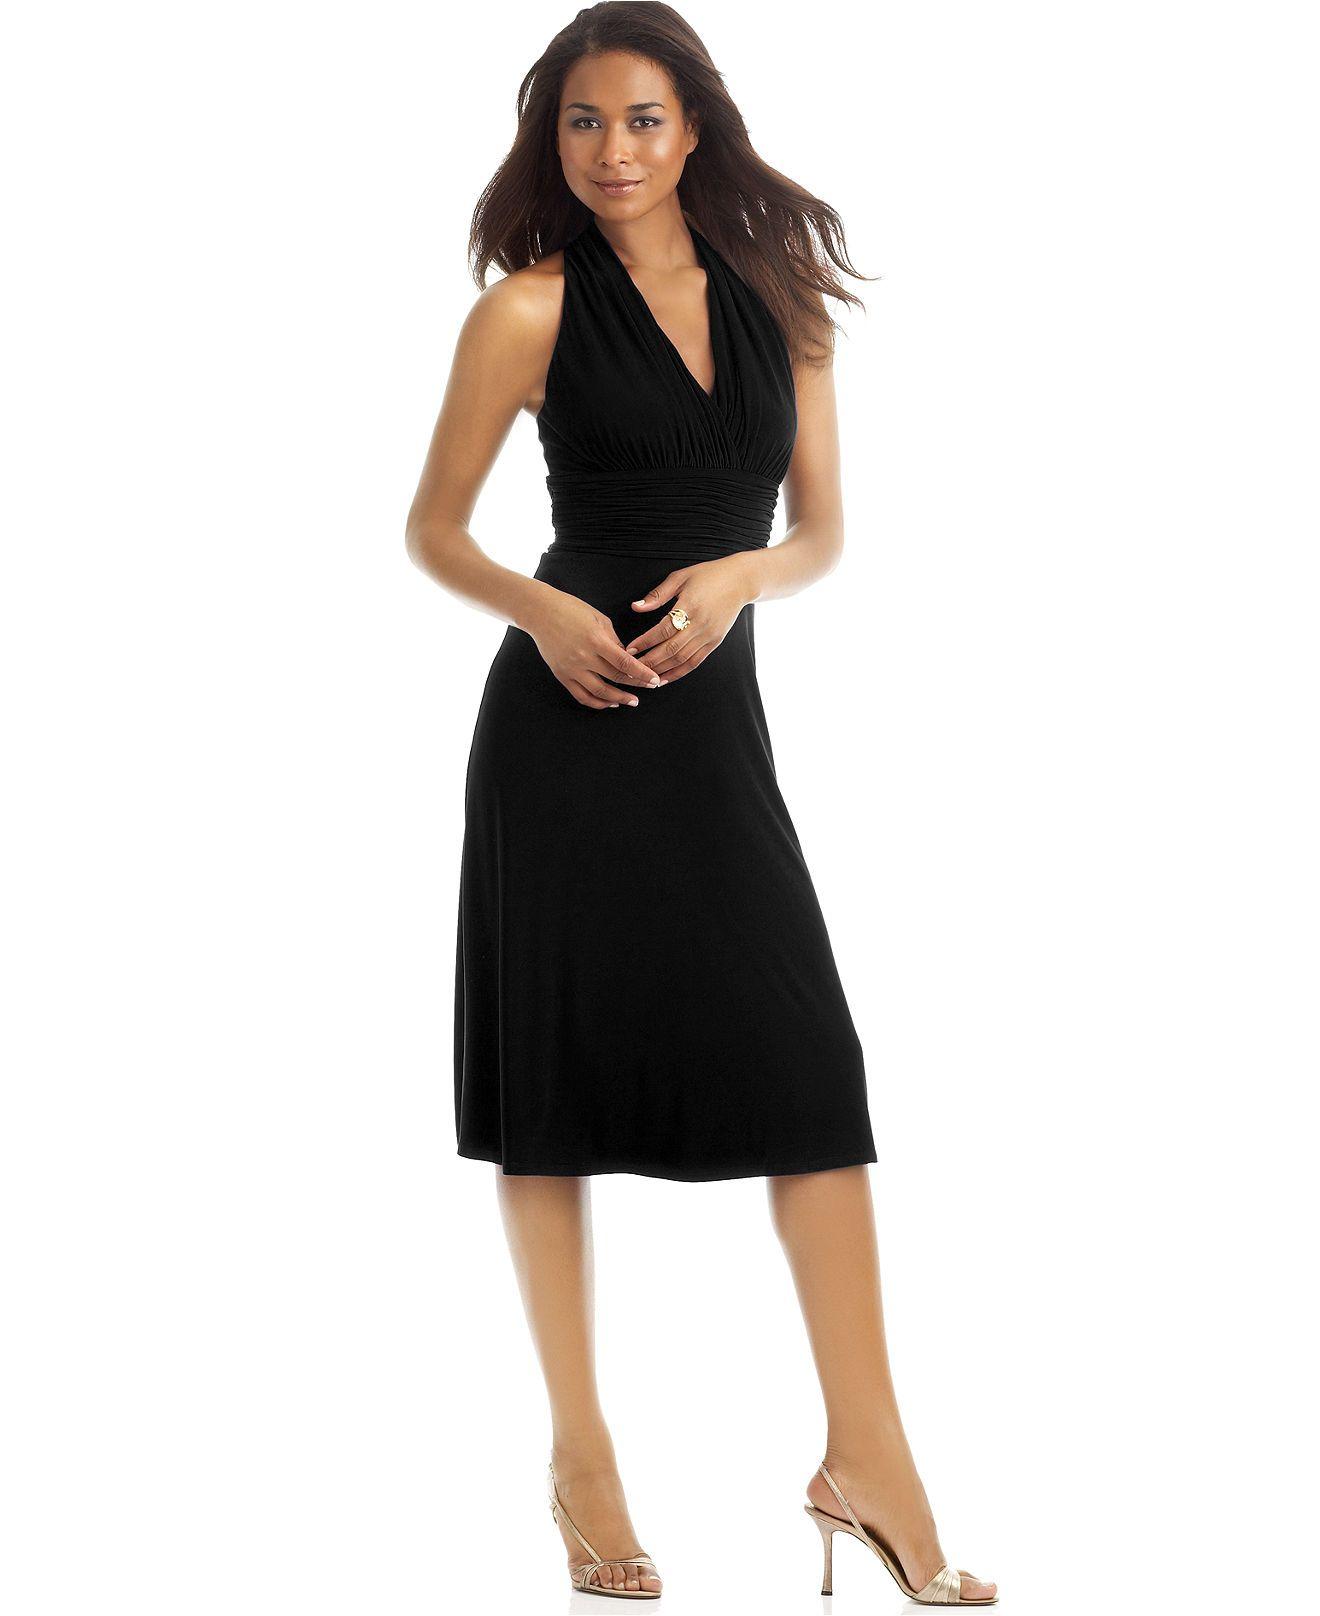 Black bridesmaid dresses macy 39 s discount wedding dresses for Macy s dresses for weddings